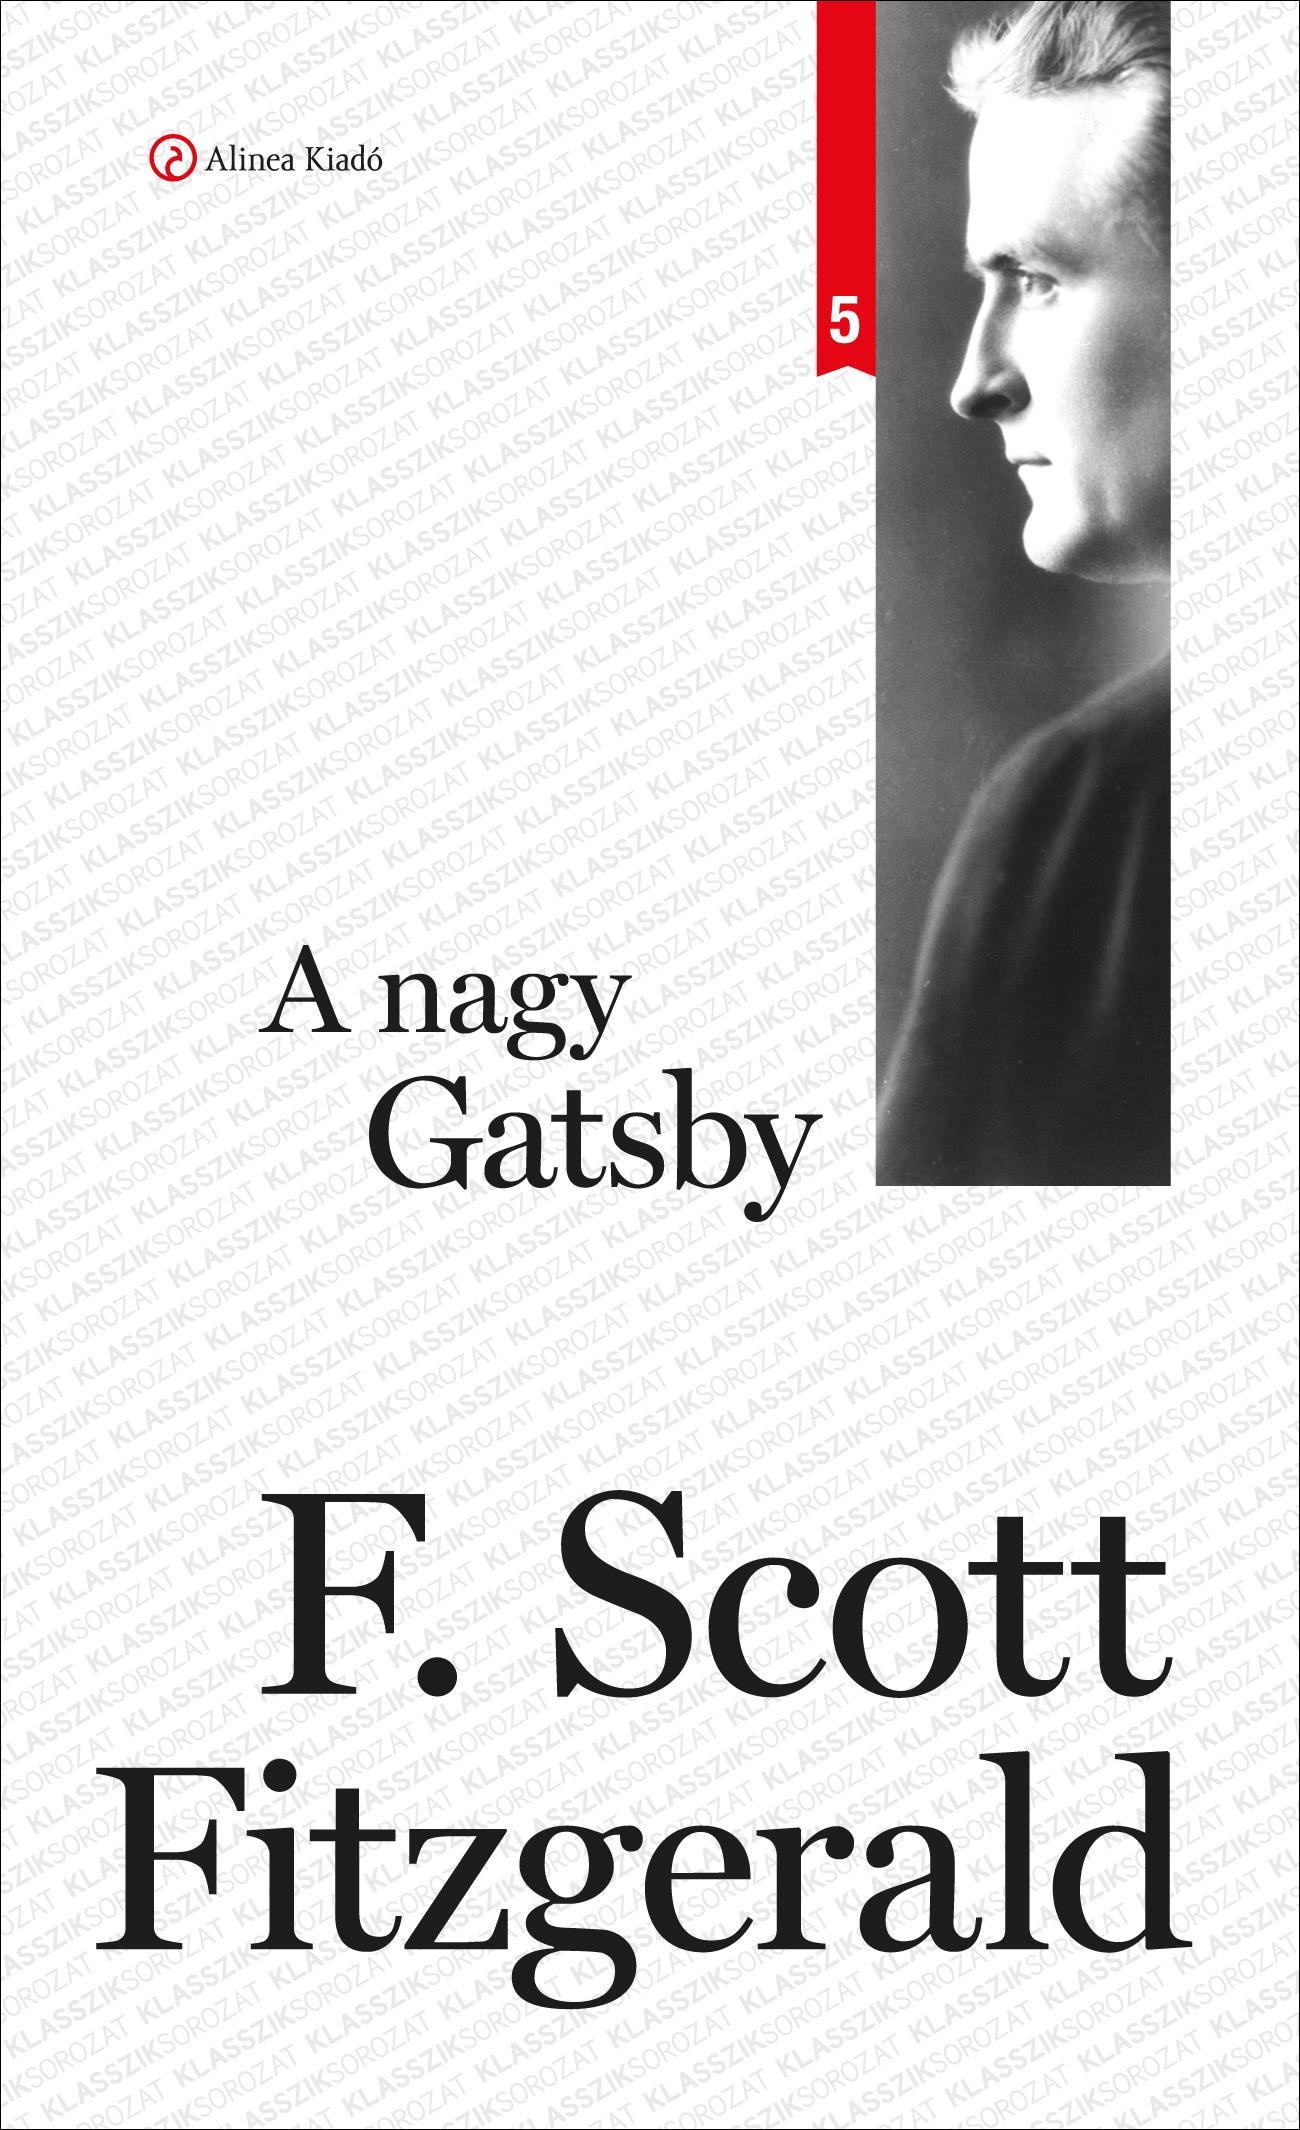 Gatsby, A nagy Gatsby